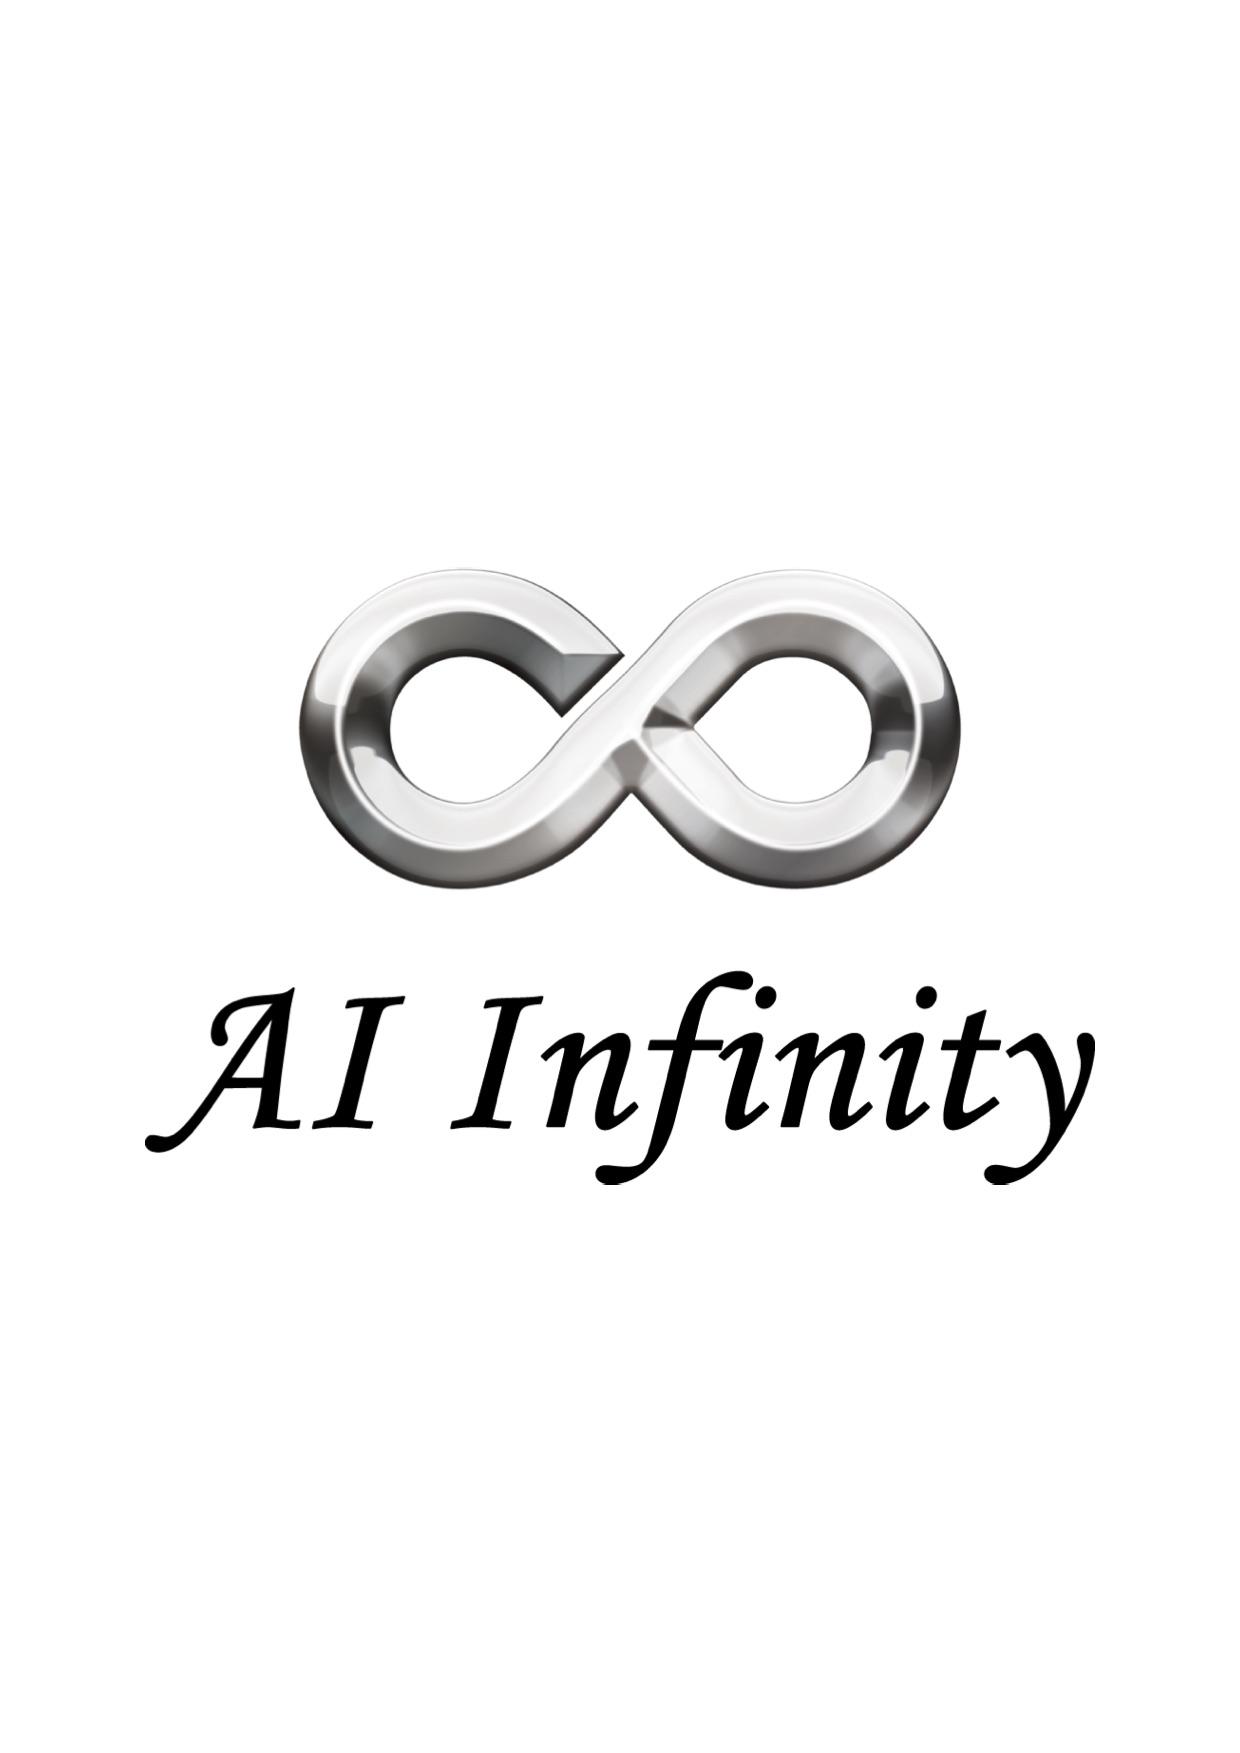 AI Infinity株式会社